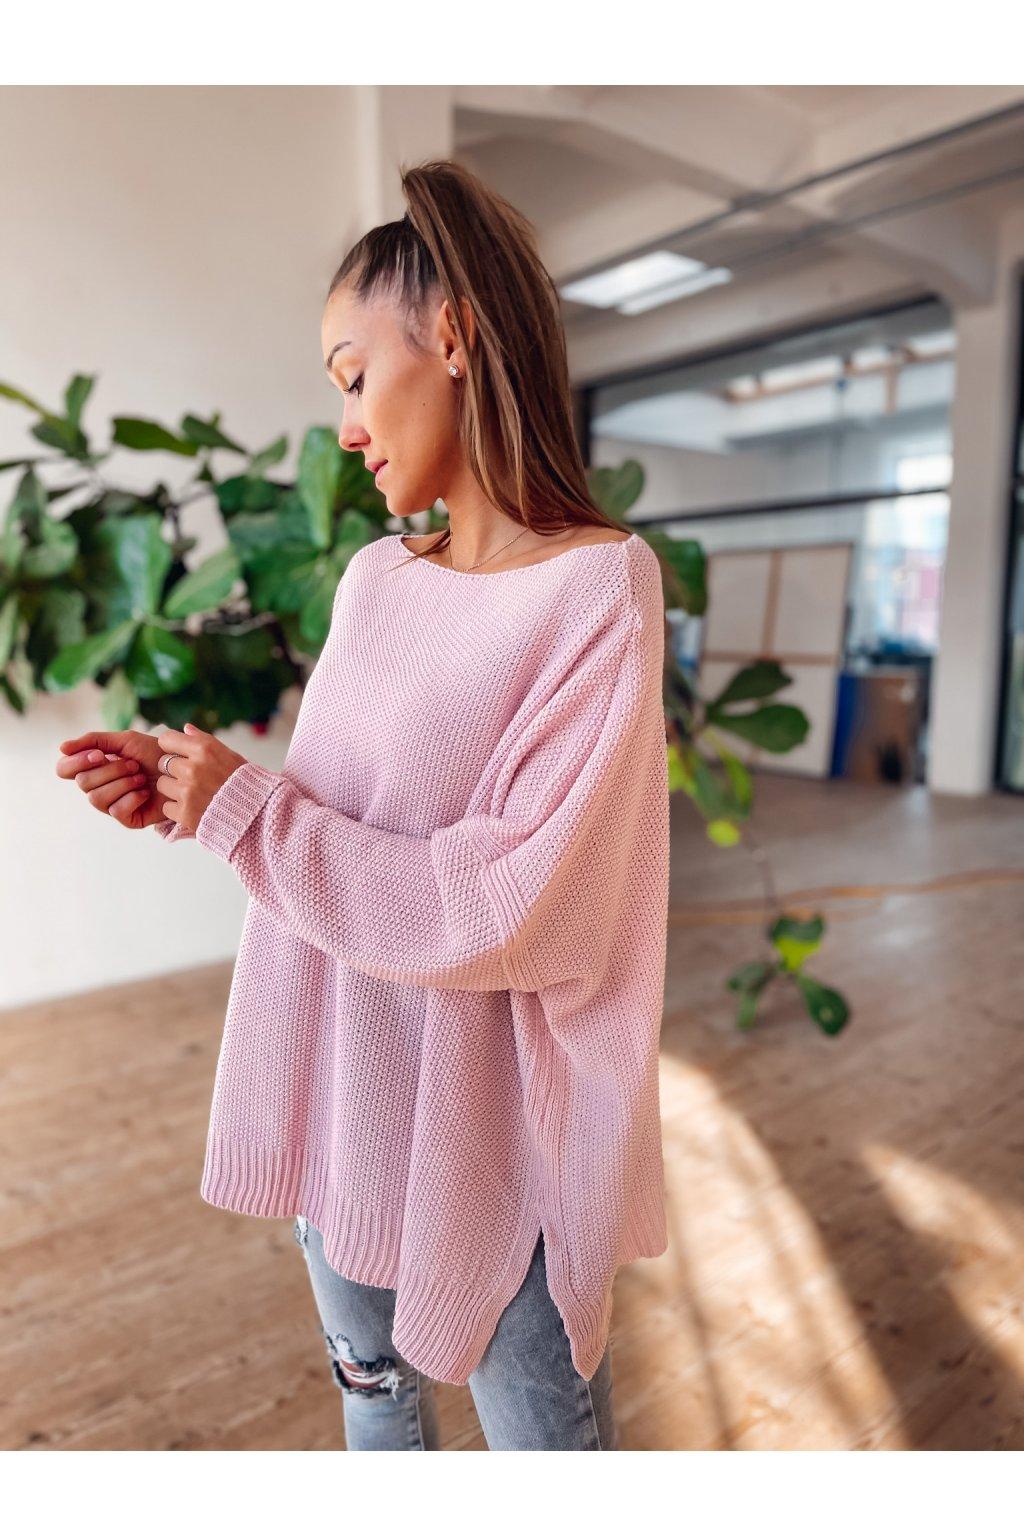 damsky oversize svetr camilo powder pink shopat cz 1